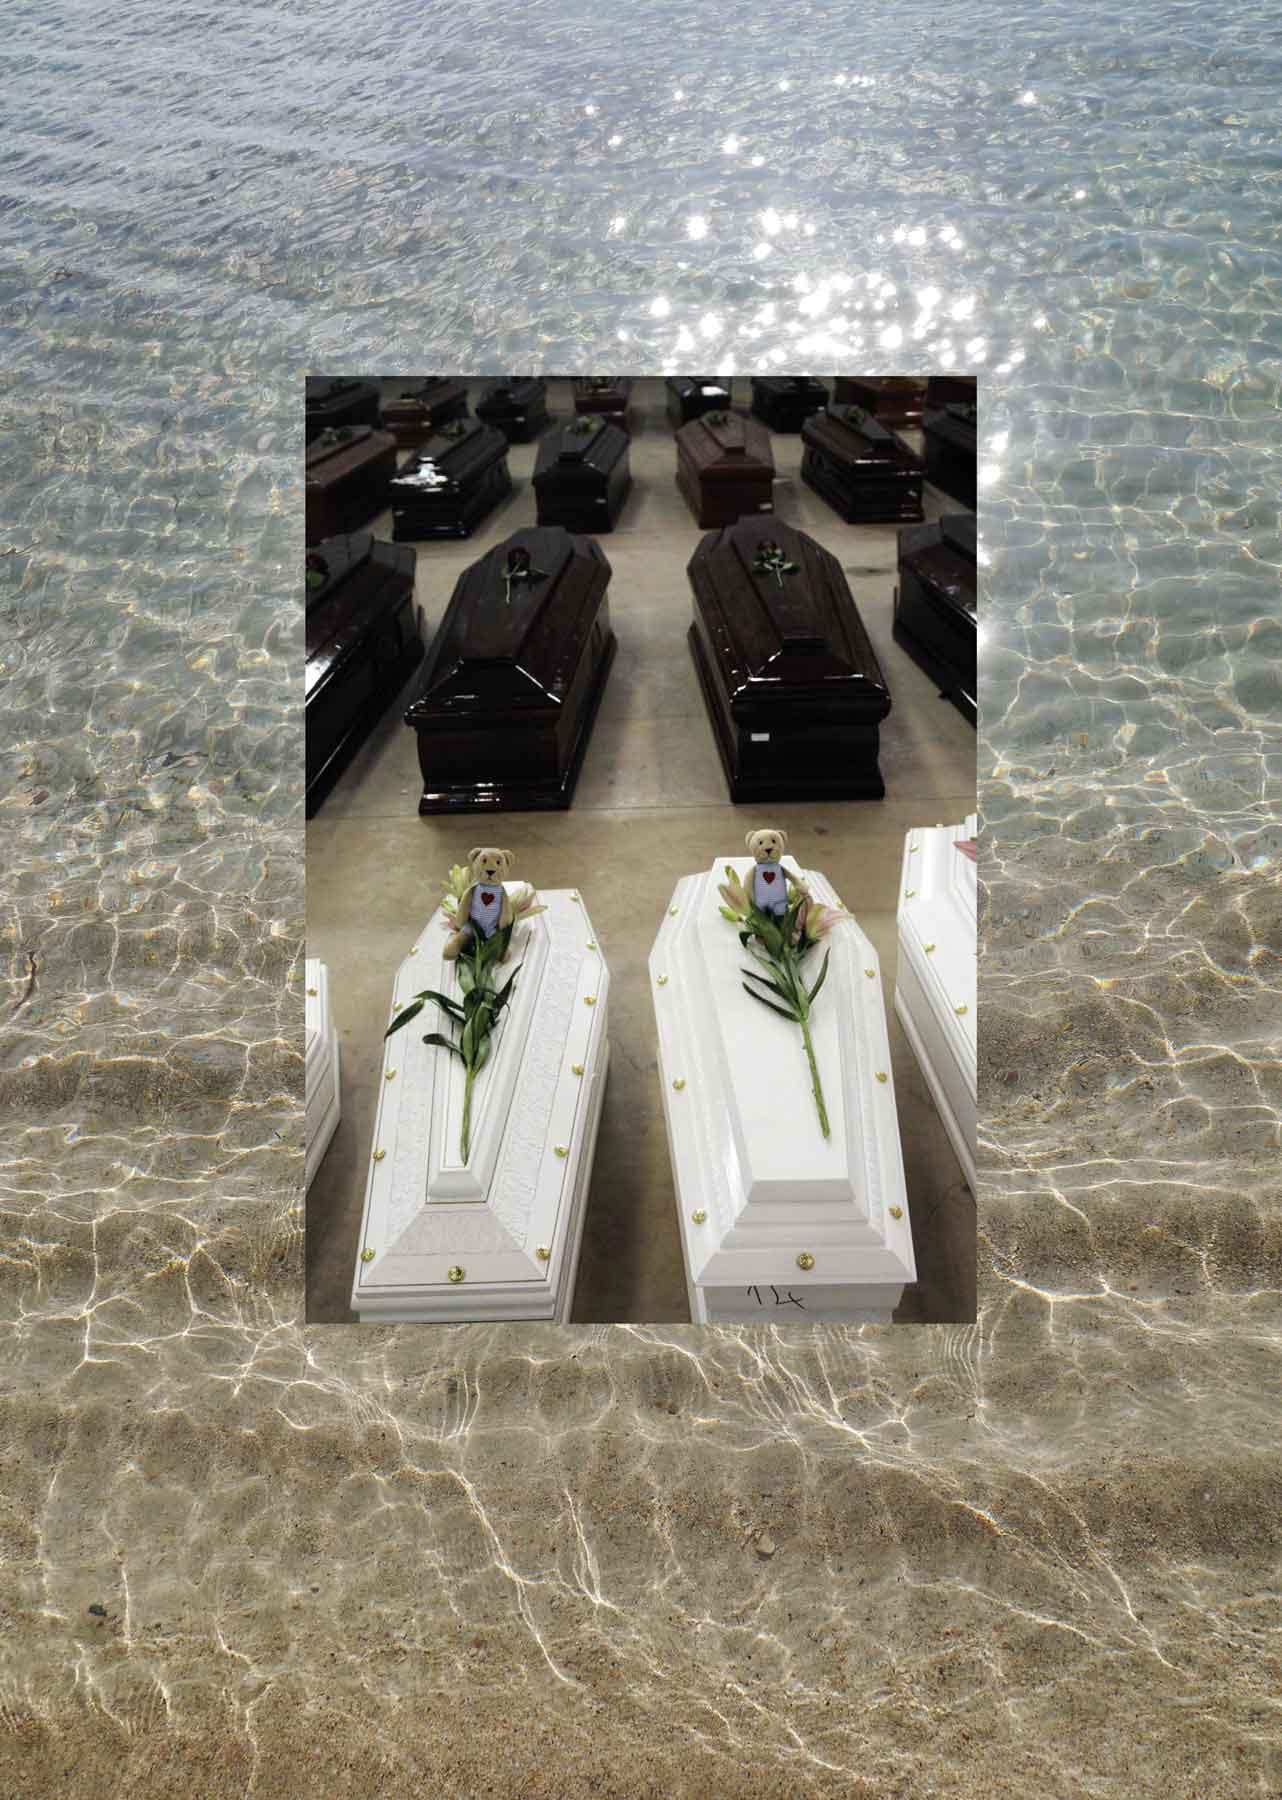 Juliette Seban – Lampedusa